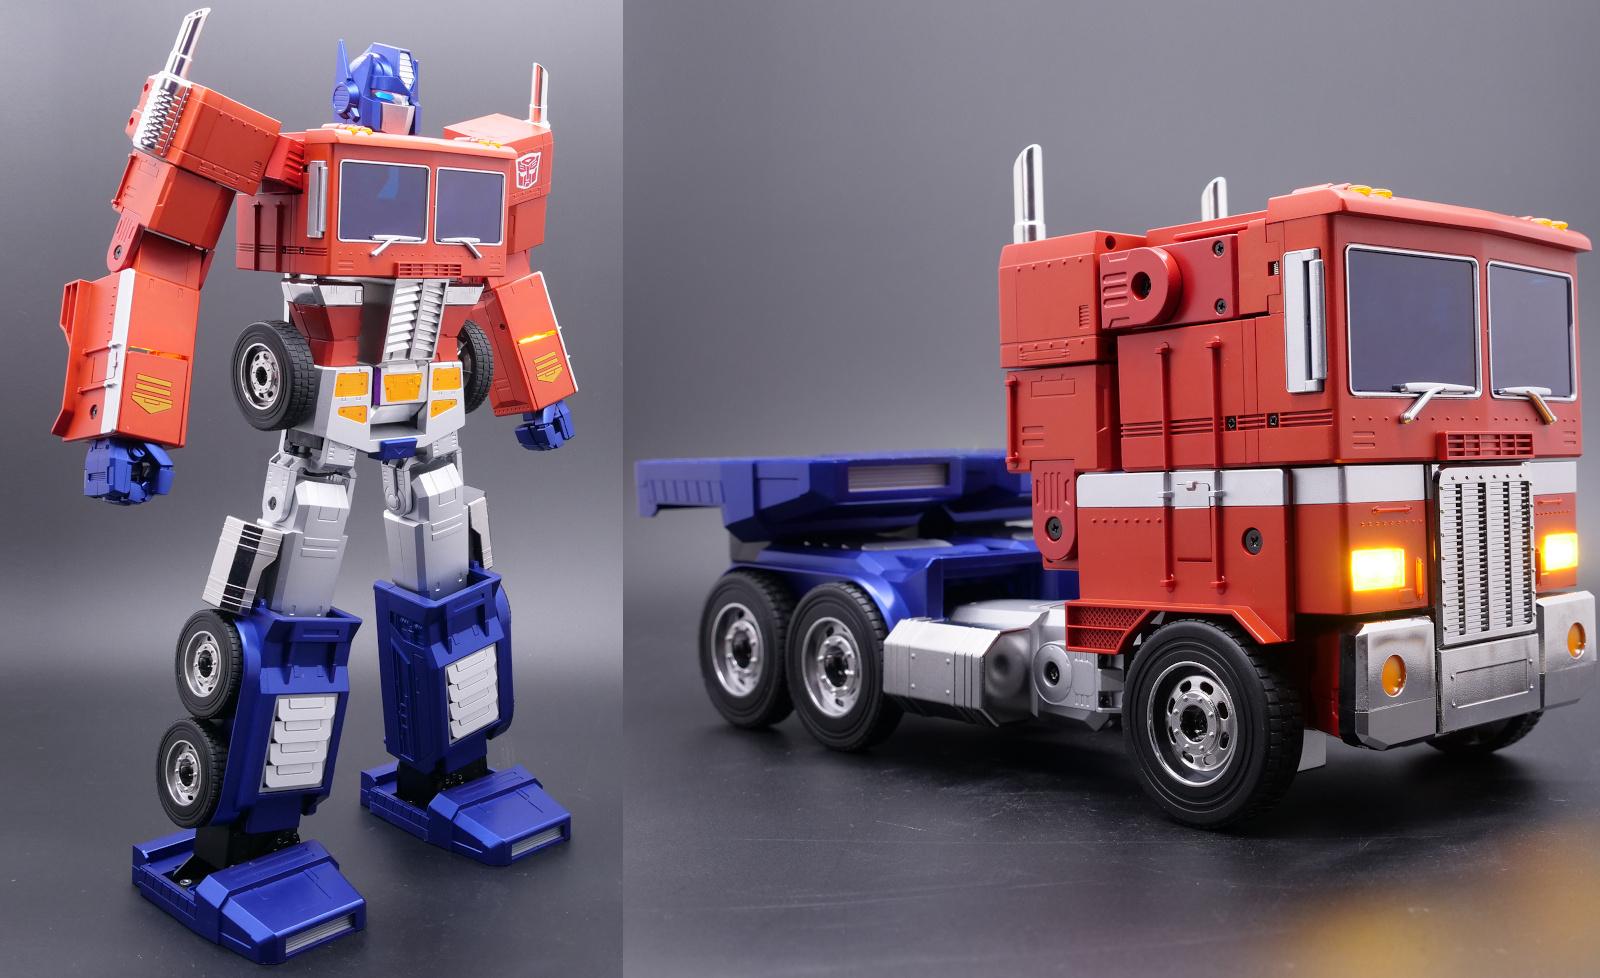 Robosen Robotics' Optimus Prime collectible responds to voice commands | Engadget